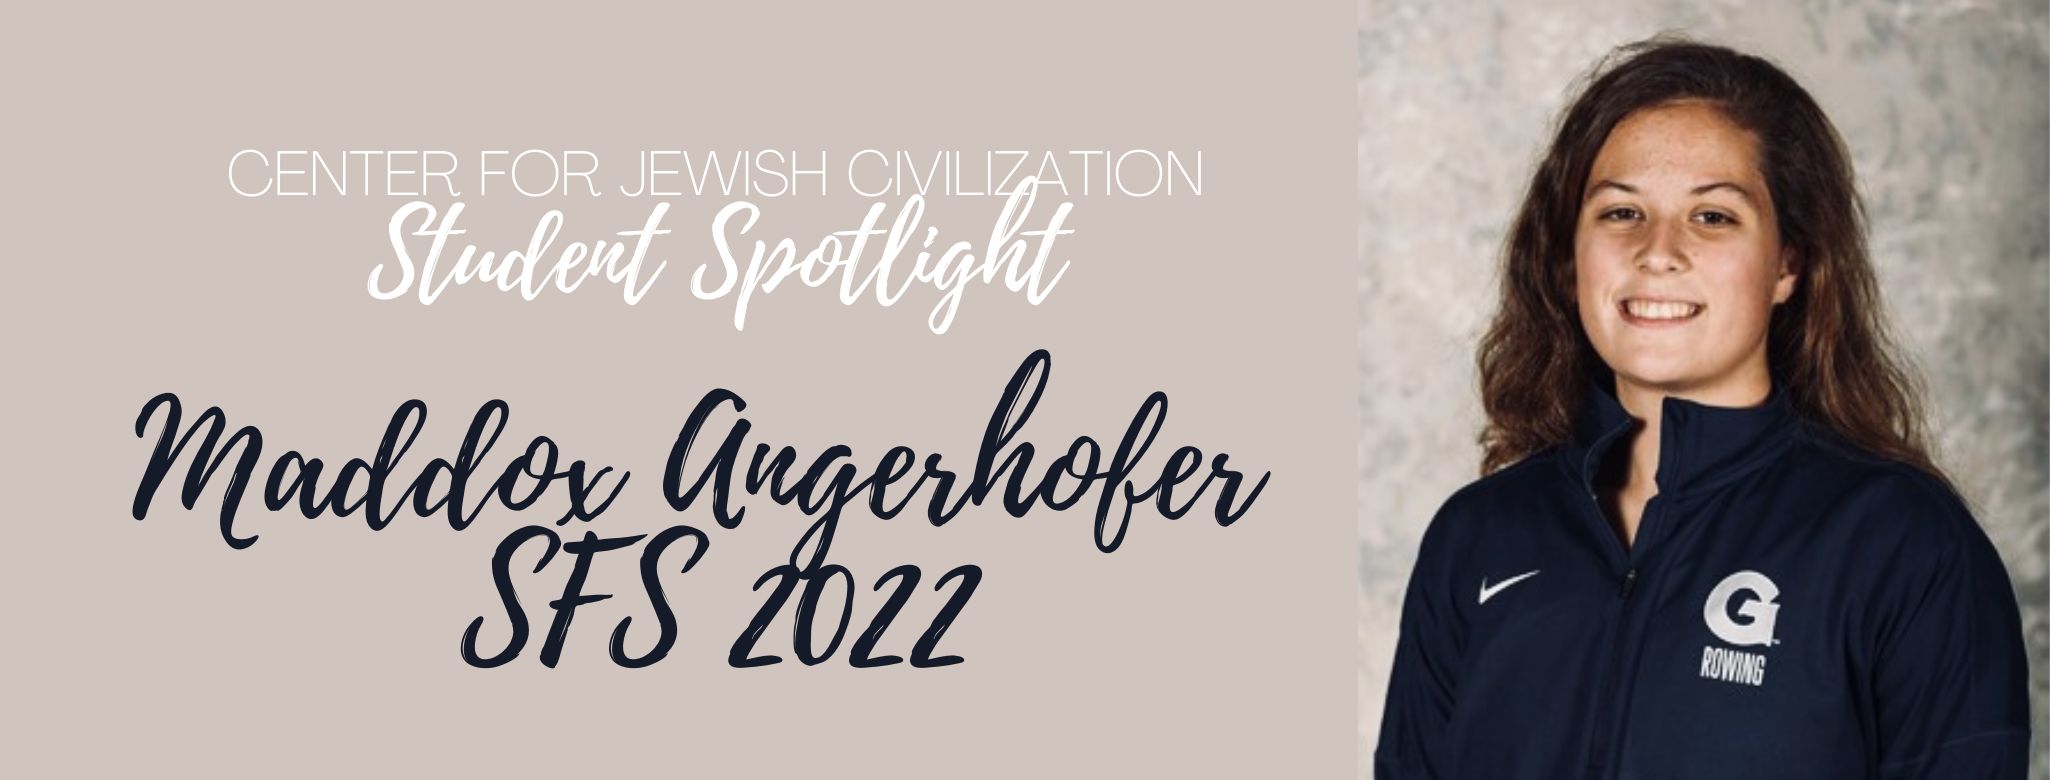 Student Spotlight: Maddox Angerhofer, SFS '22